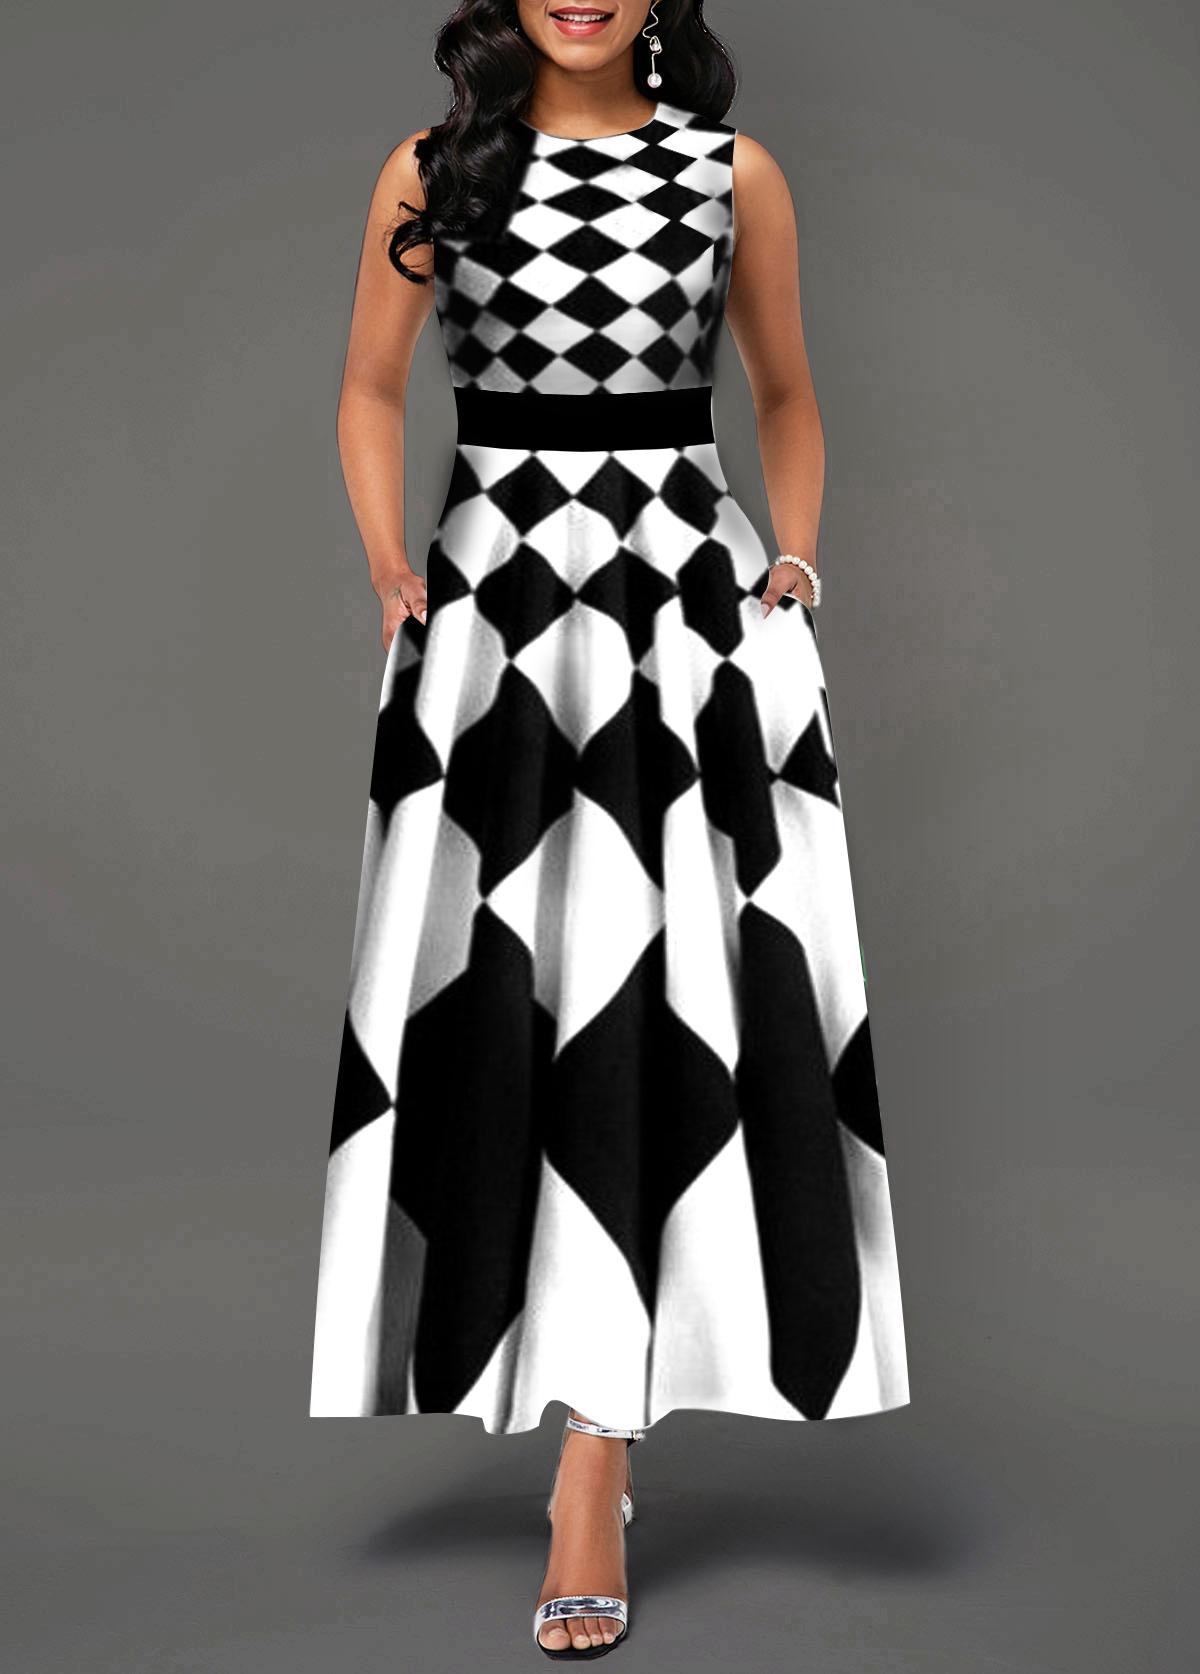 High Waist Sleeveless White Maxi Dress